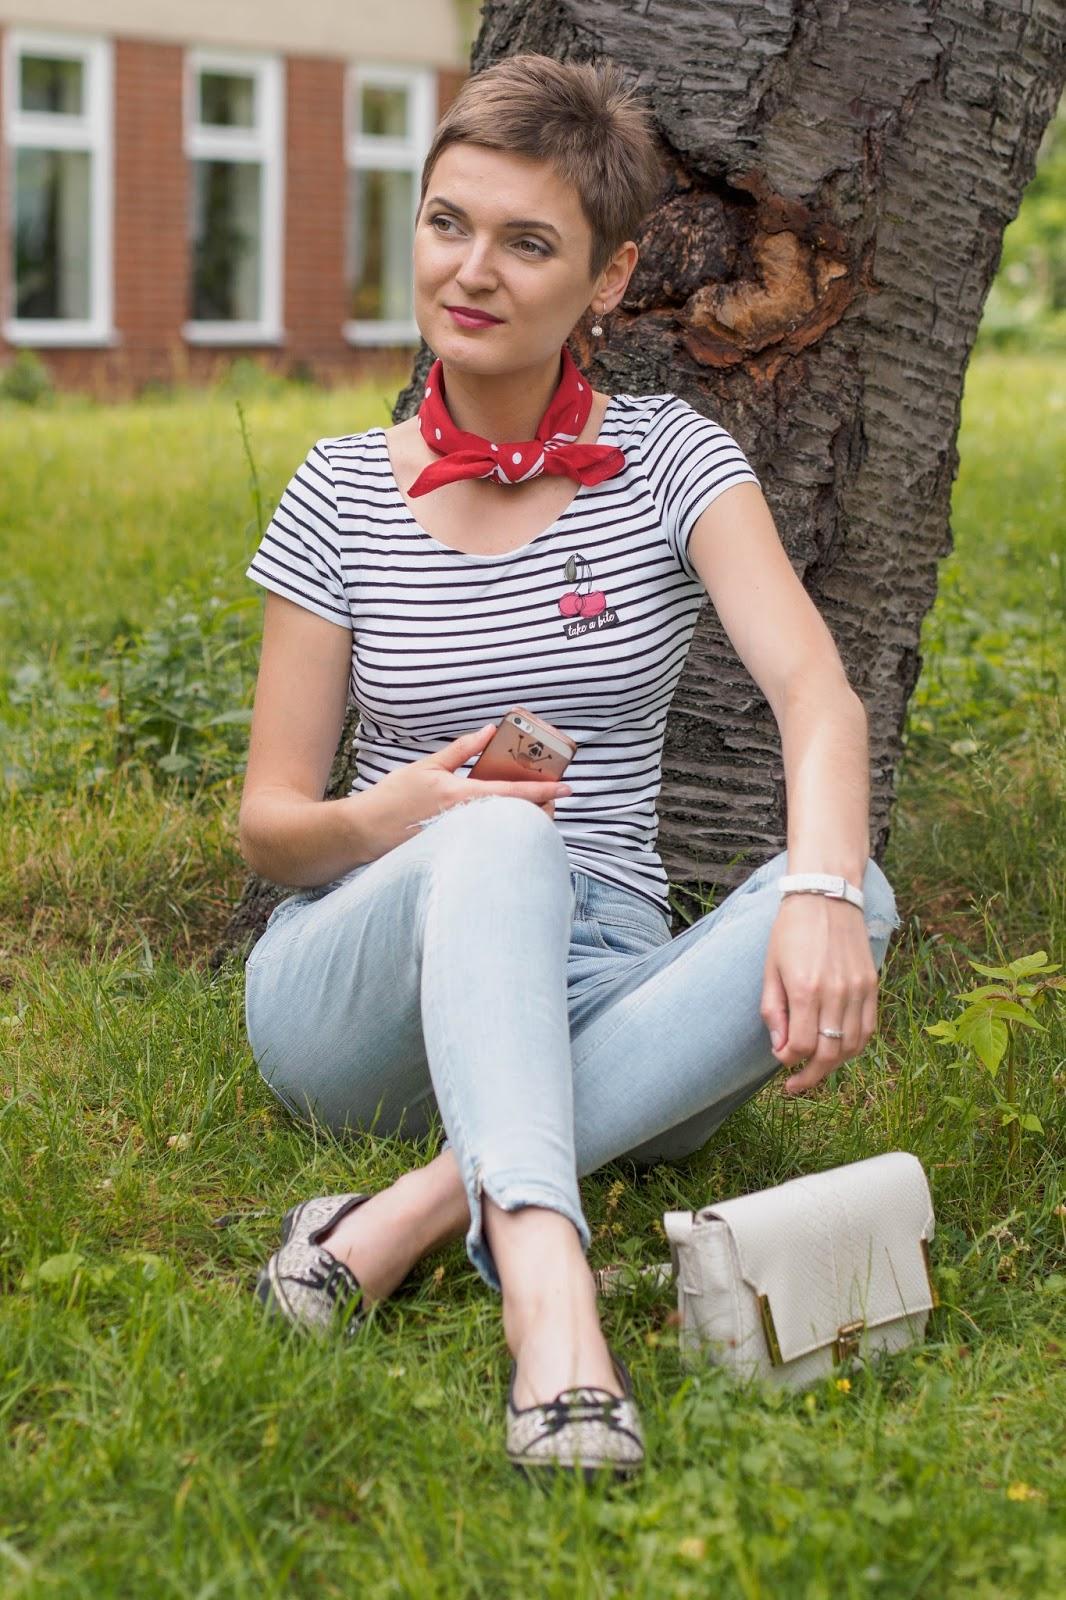 T-shirt - C&A ripped jeans - ZARA flats - F&F crossbody bag - Primark scarf - ETEX Hořice